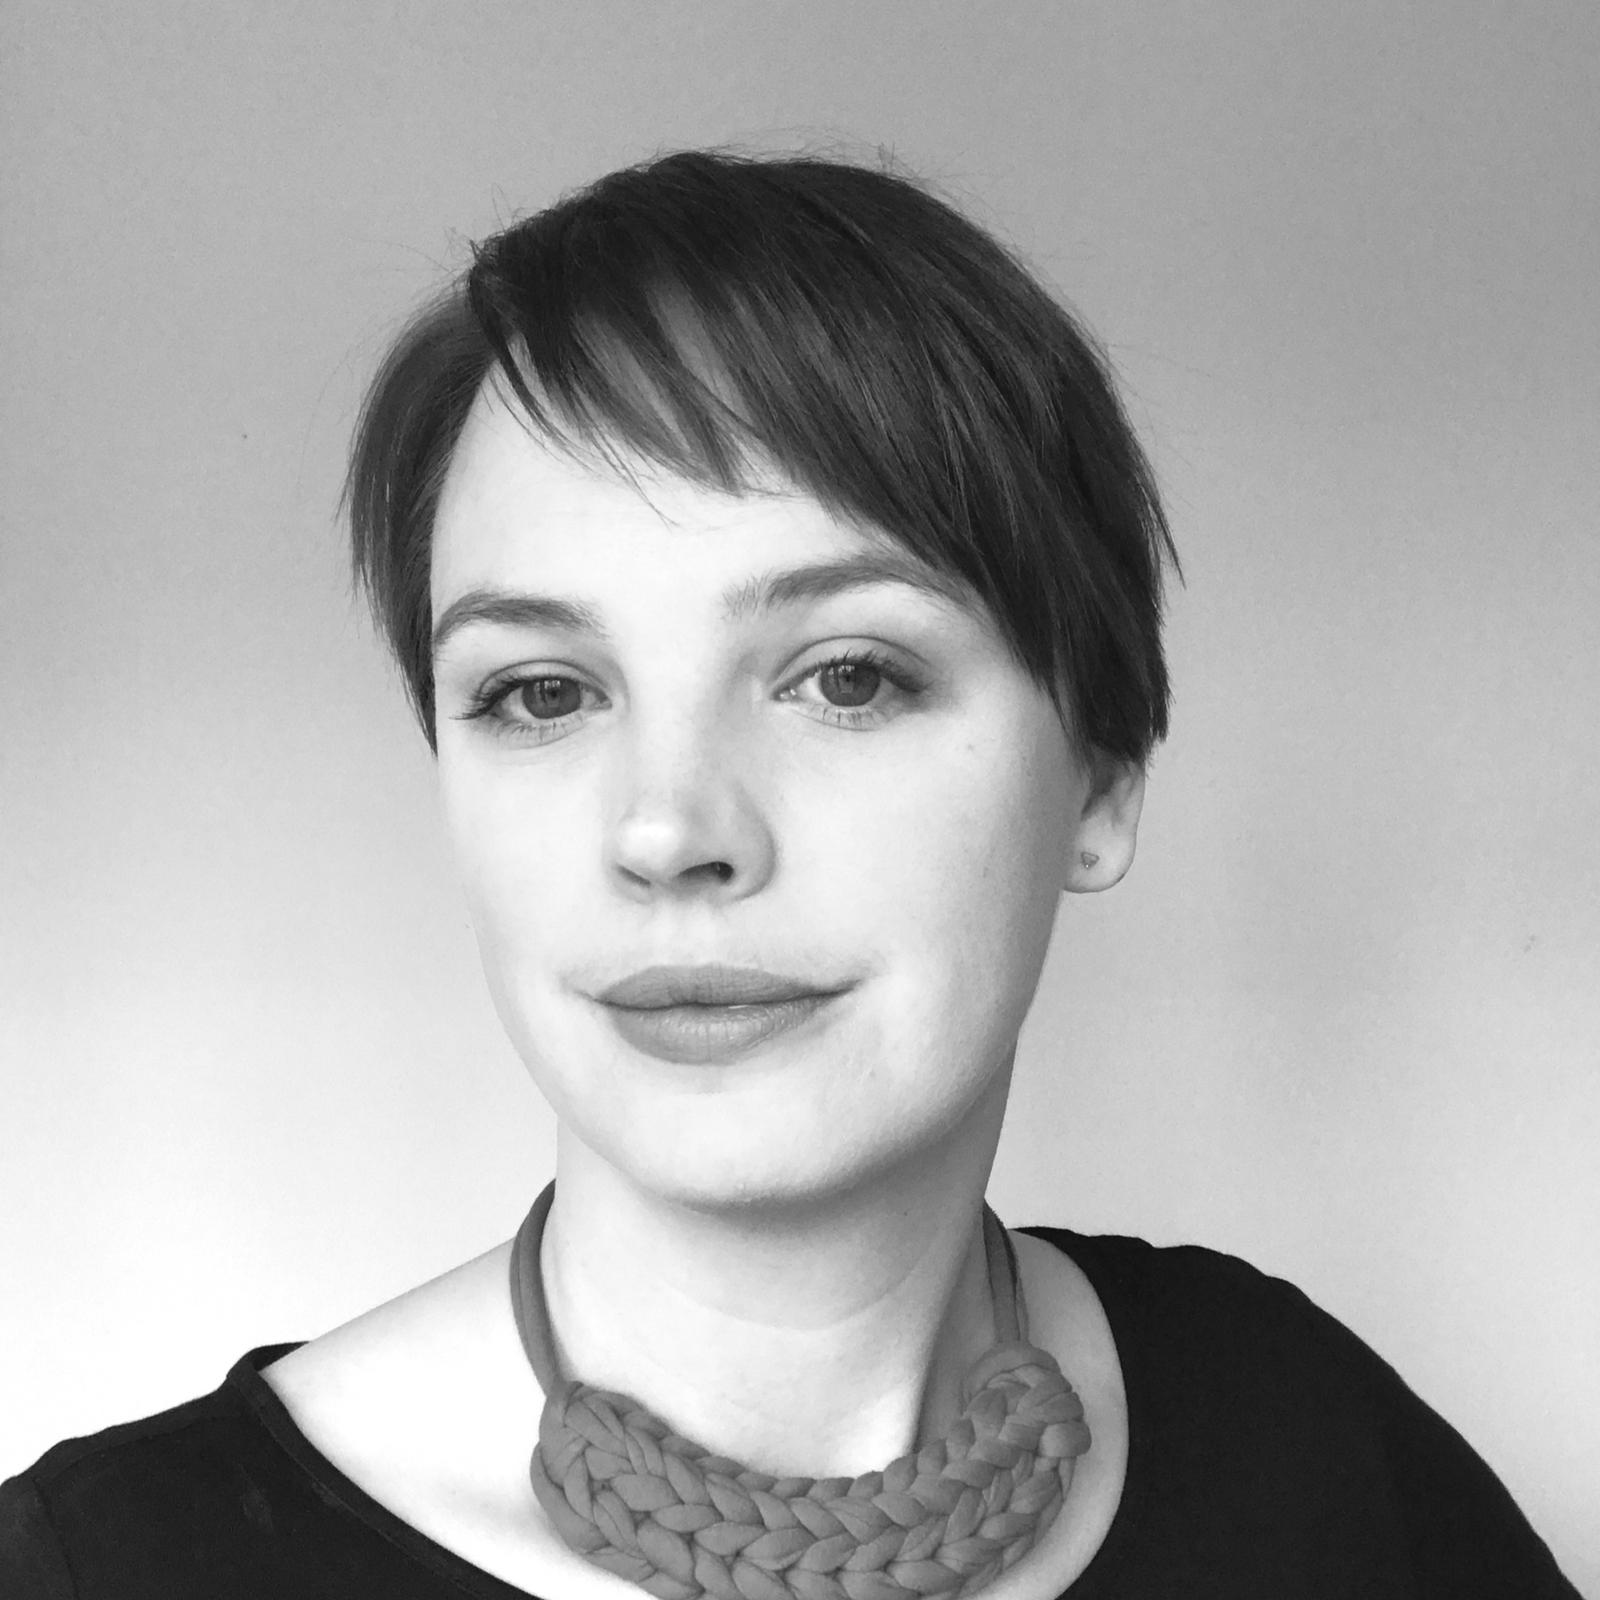 Nicole Bouchard-Tejeiro - Director, Business Process, Crozier Fine Arts